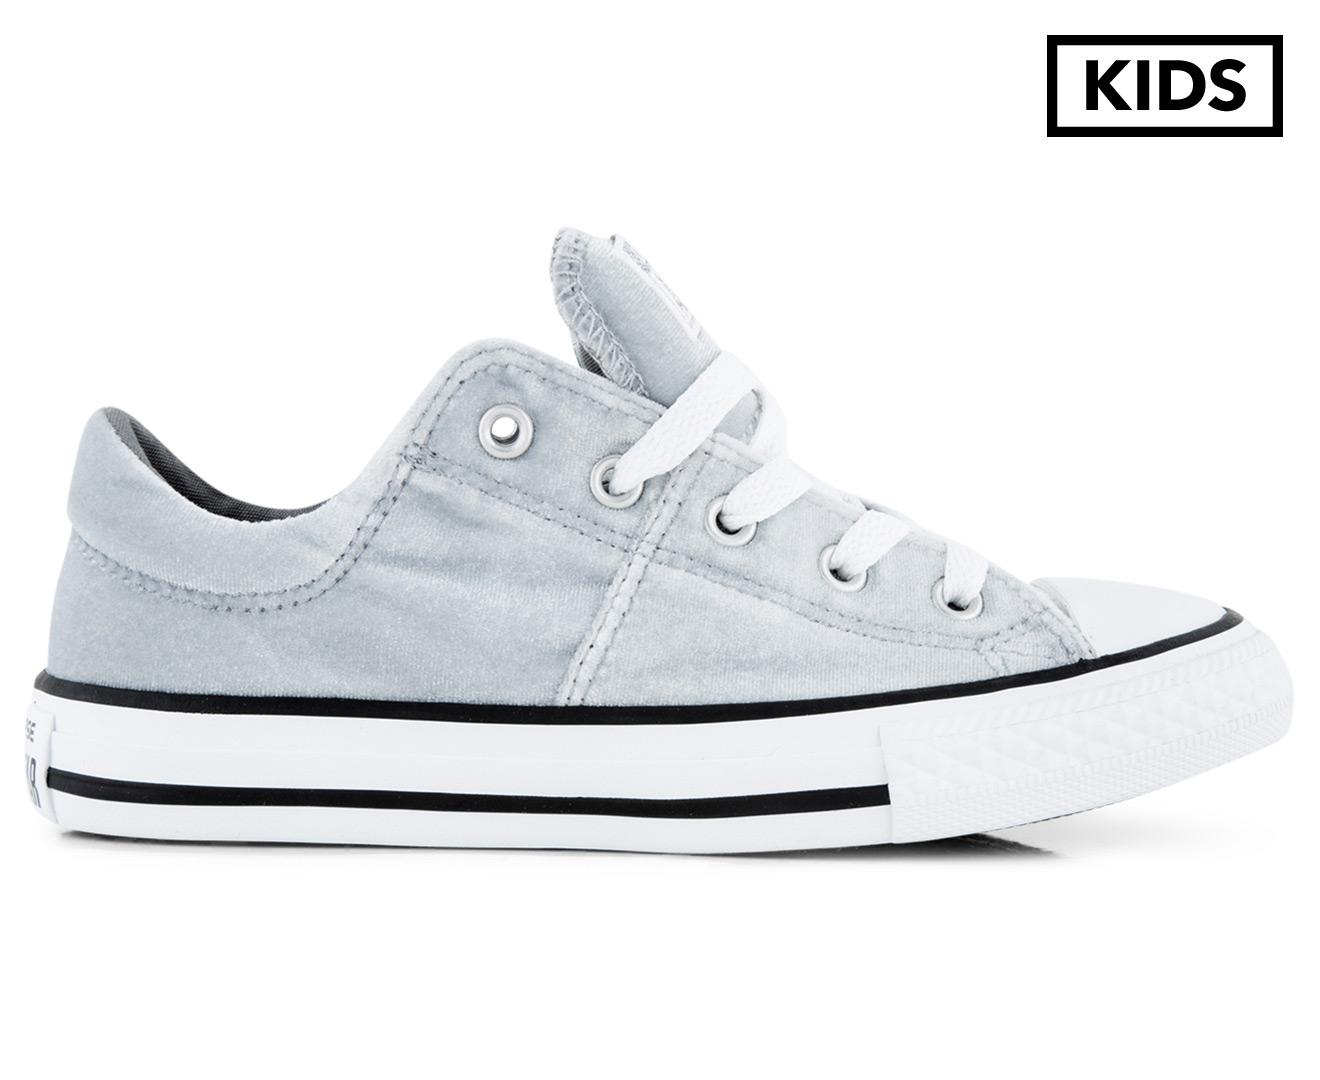 Converse Kids Chuck Taylor All Star Madison Ox Shoe